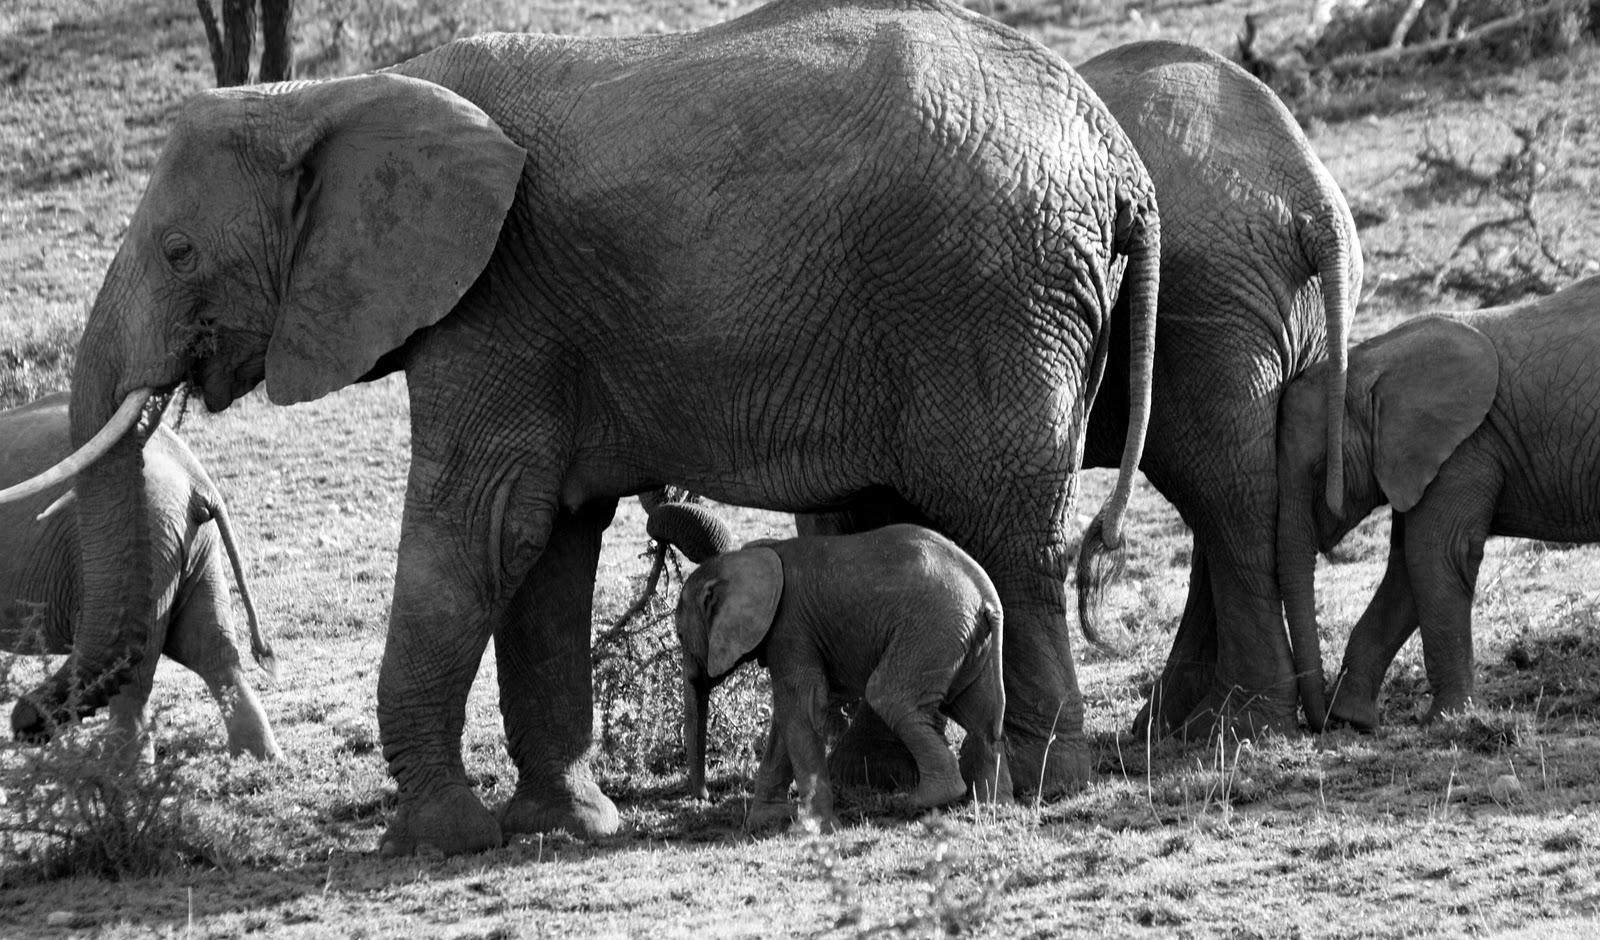 Elephant Baby #elephant #elephantbaby #tanzania #africa 2011